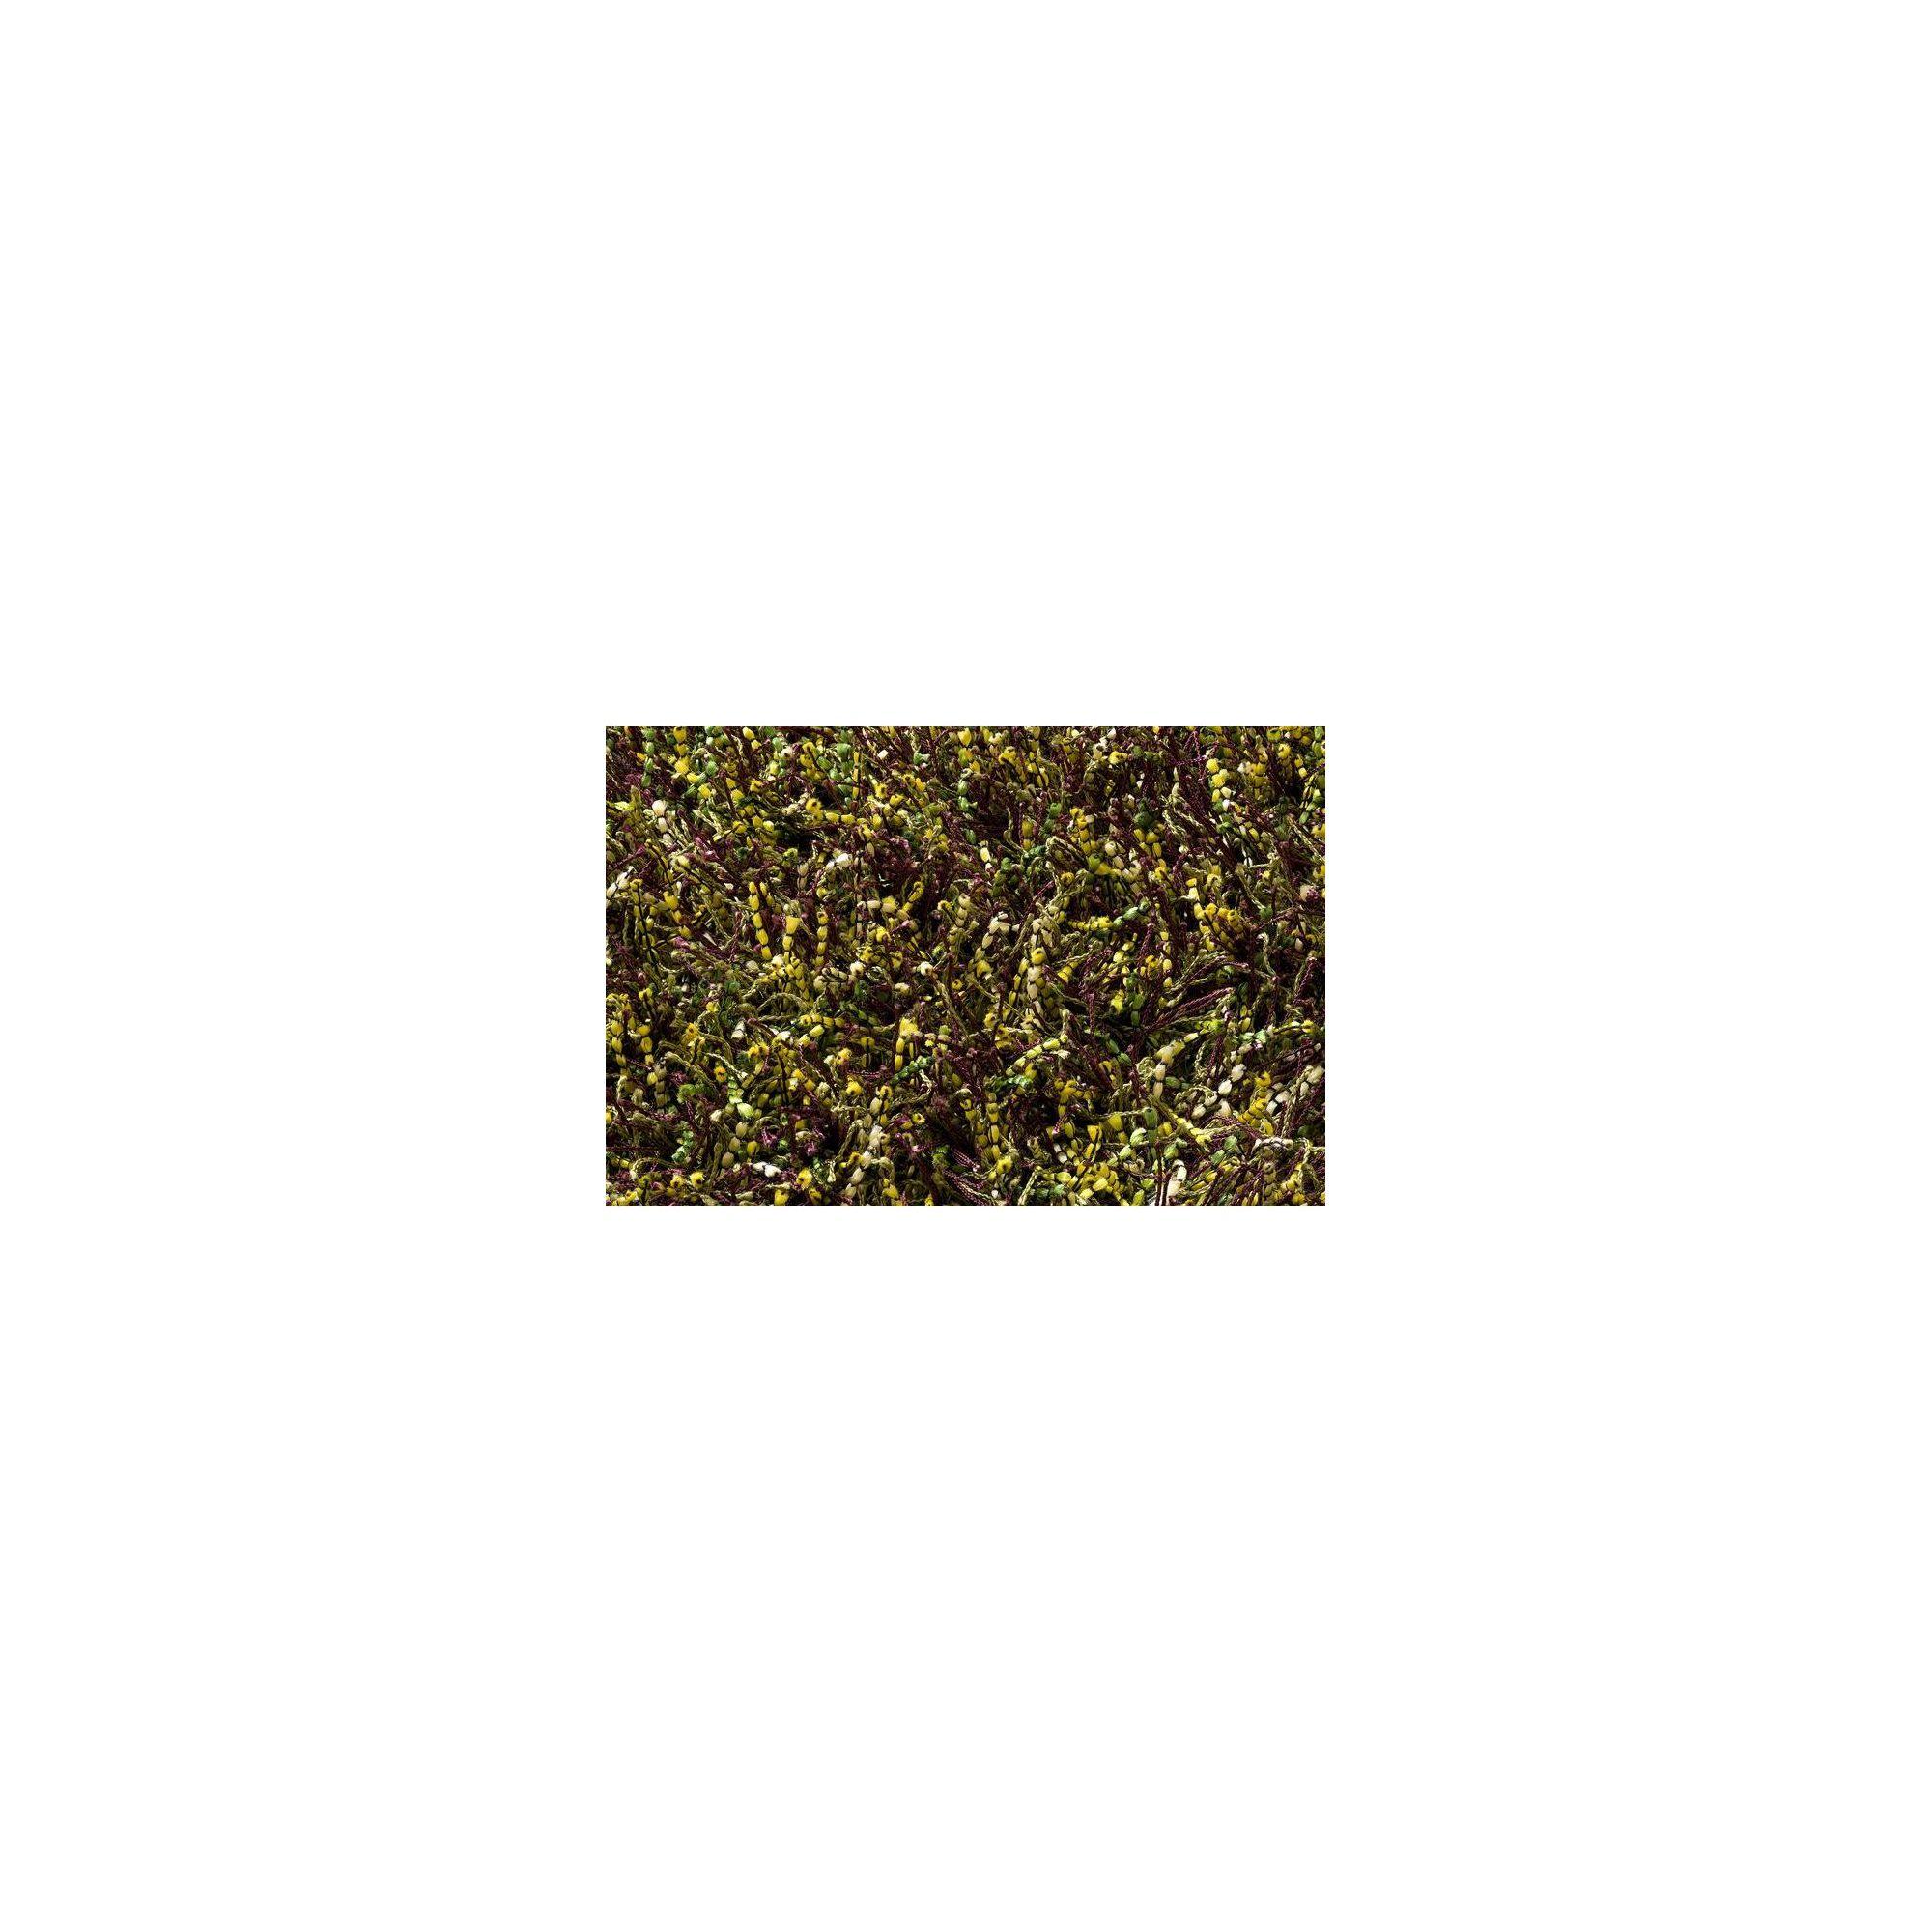 Linie Design Sprinkle Lime Shag Rug - 300cm x 200cm at Tesco Direct